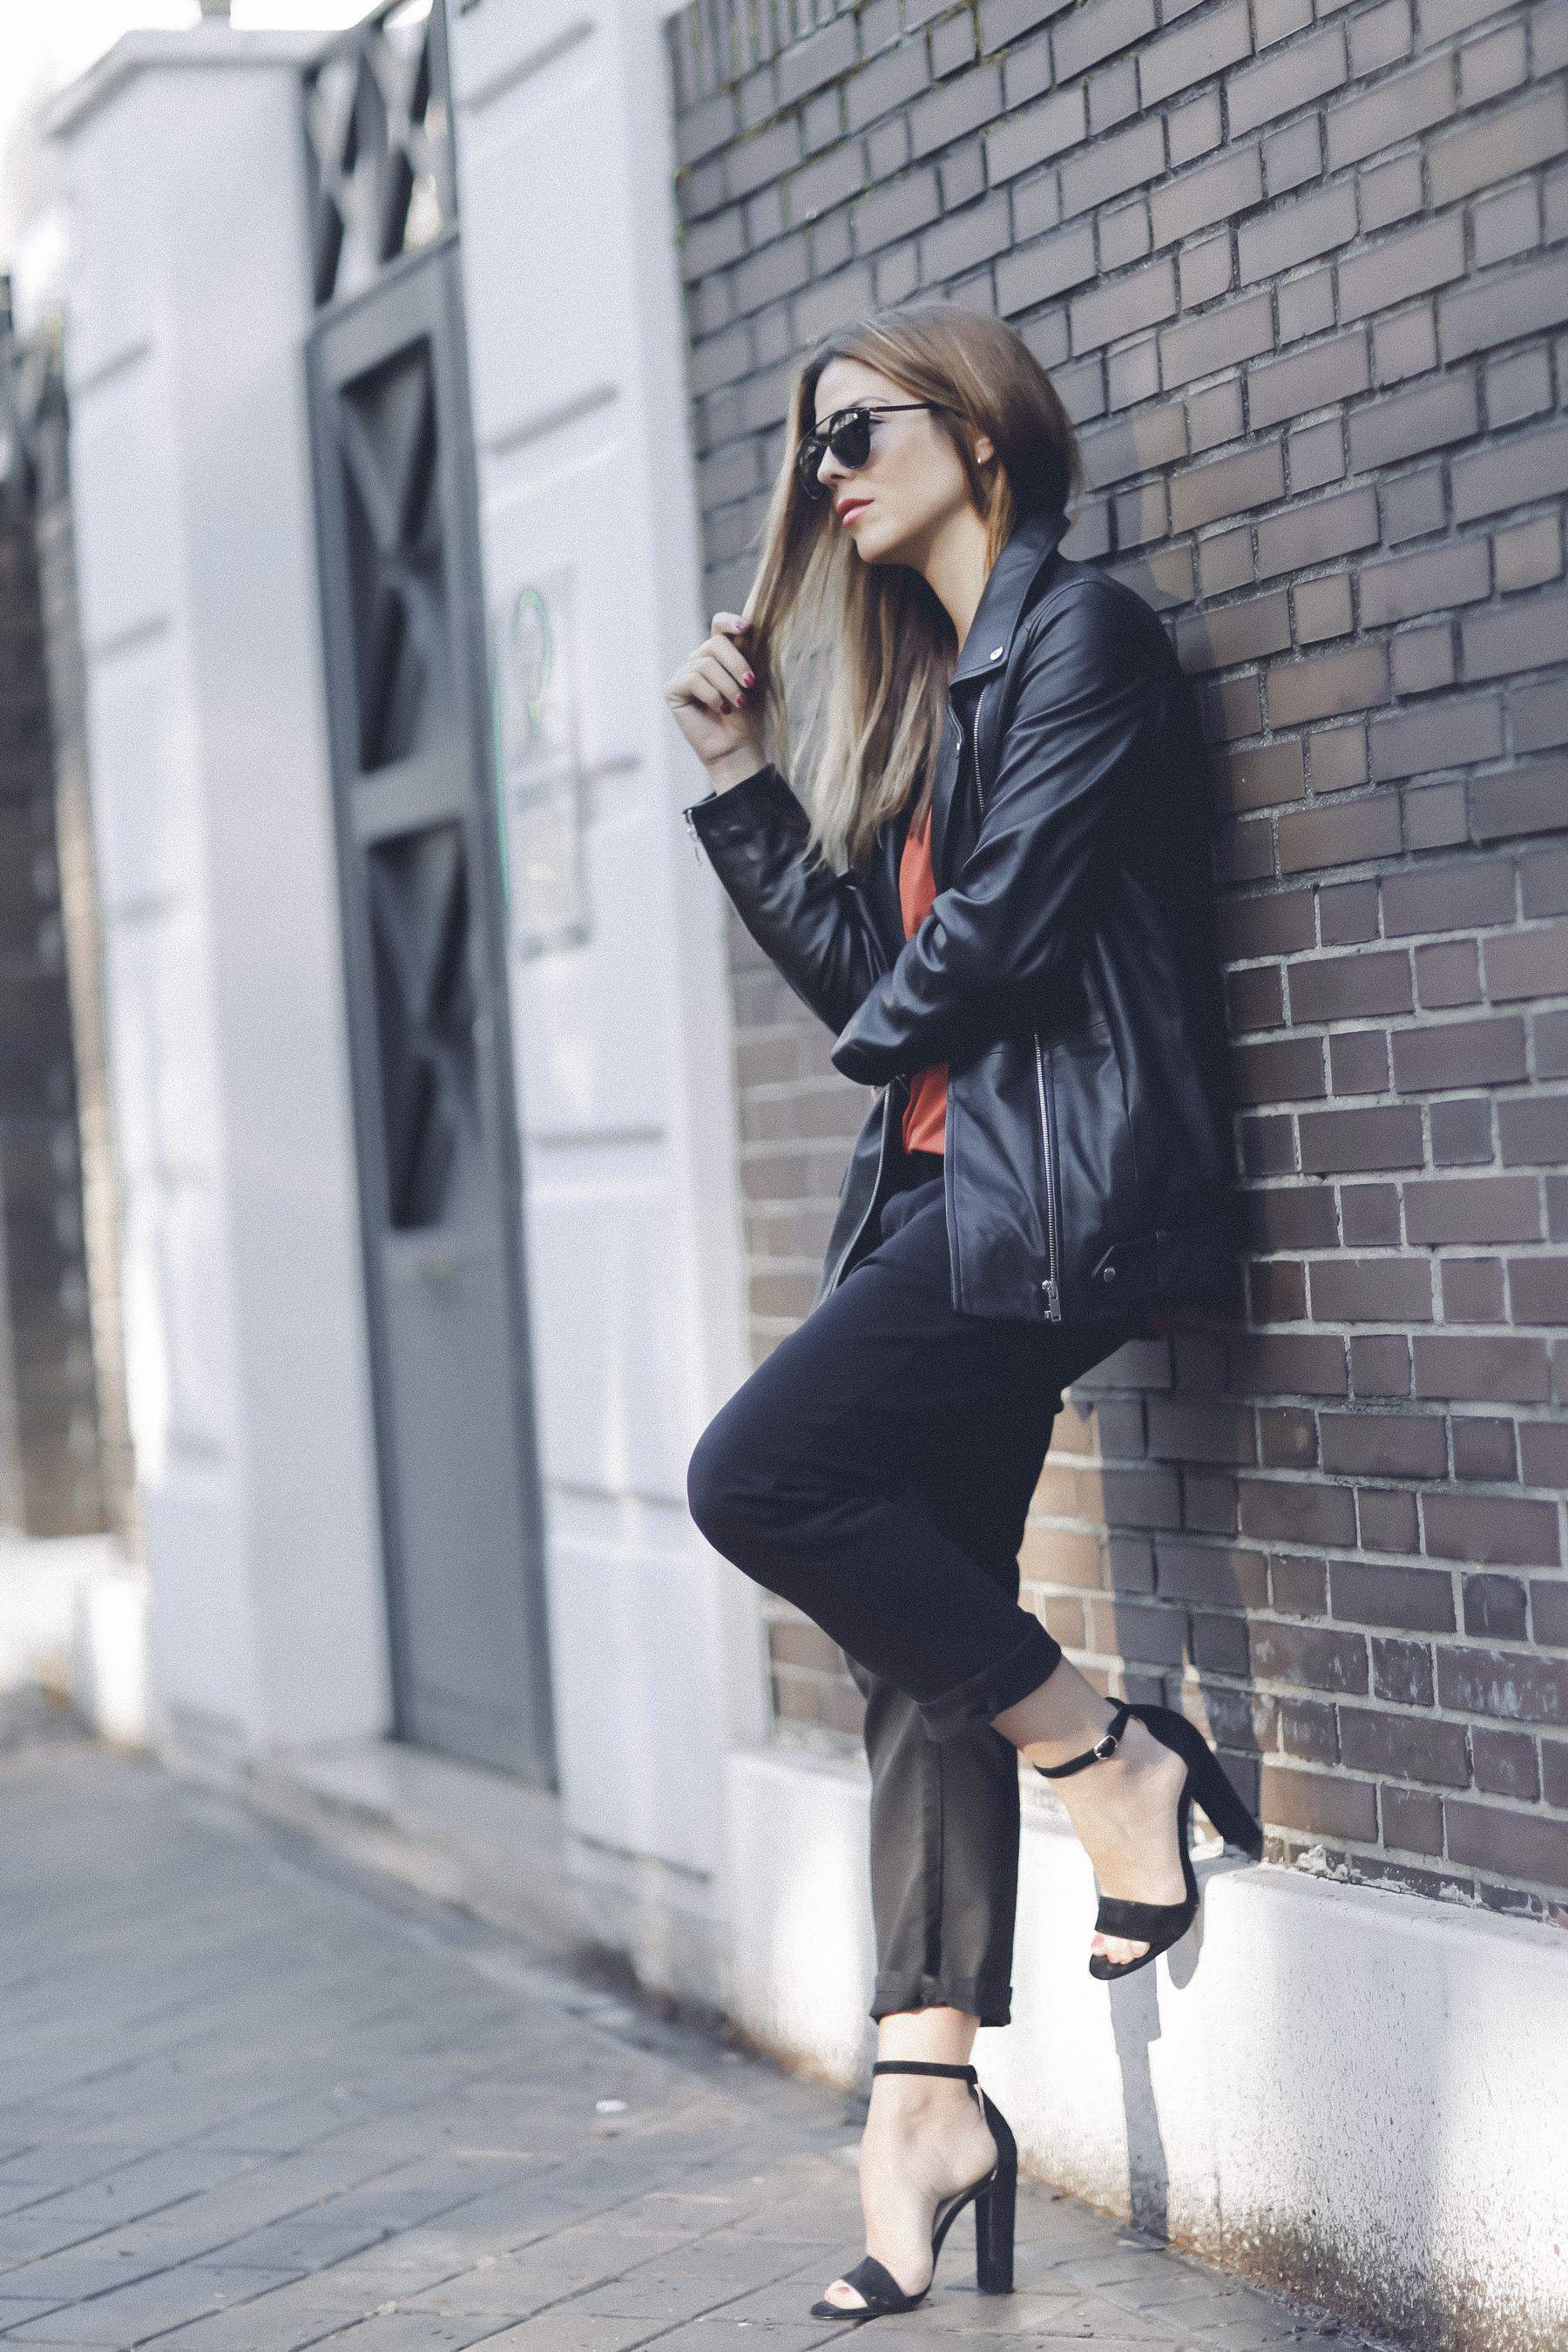 sandalias sandals mbym outfit look primavera spring camiseta zara steve madden Dior gafas de sol sunglasses street style trendy taste_7